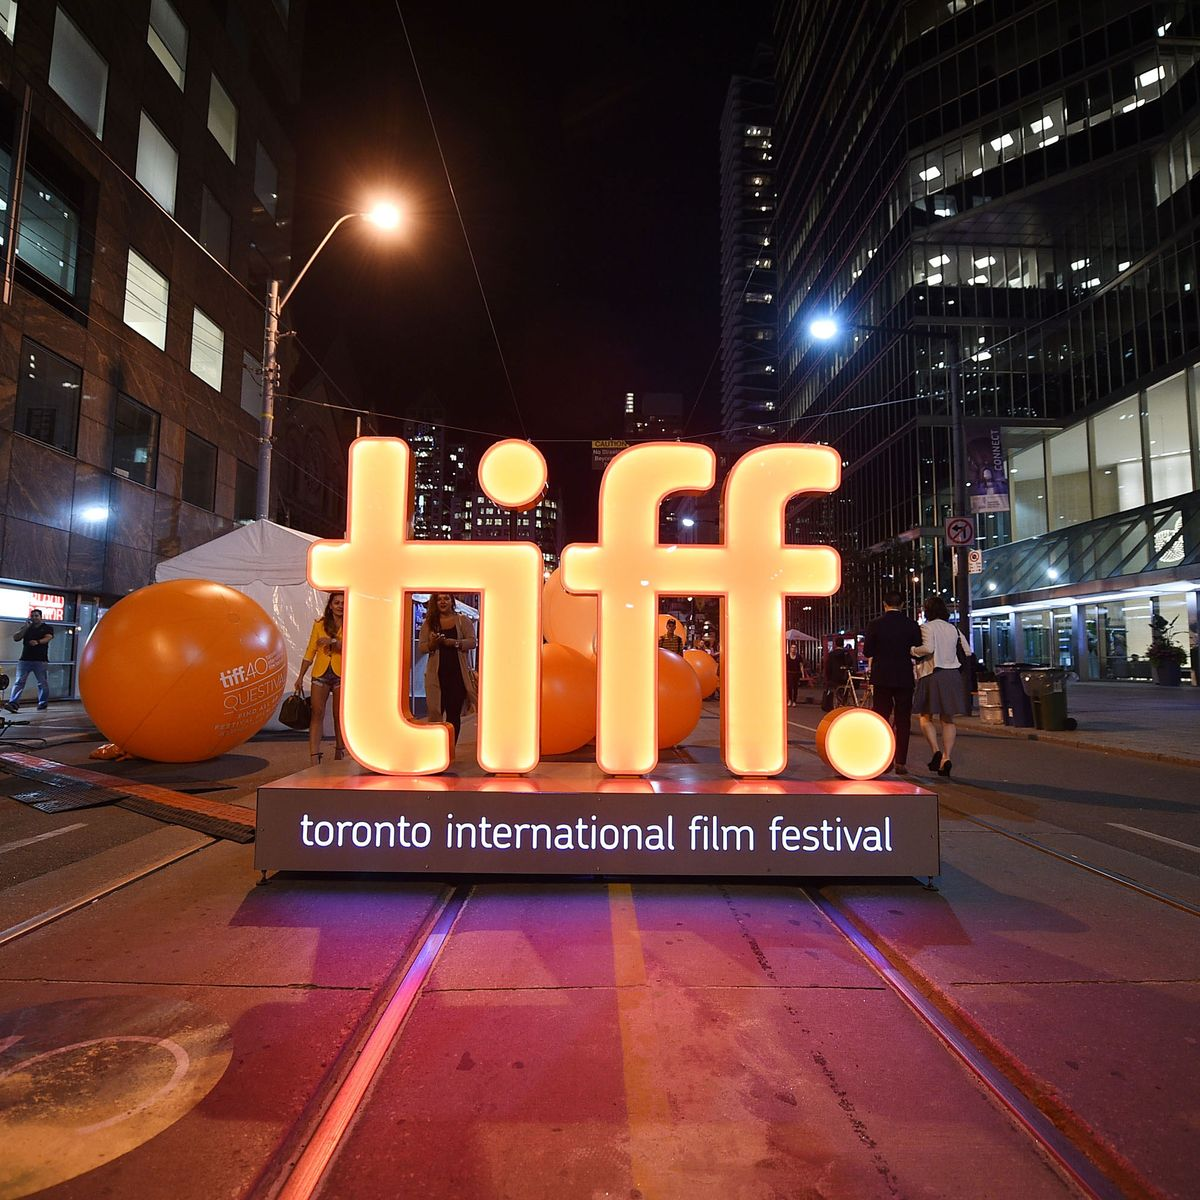 Toronto International Film Festival 2020 Is Mask Optional